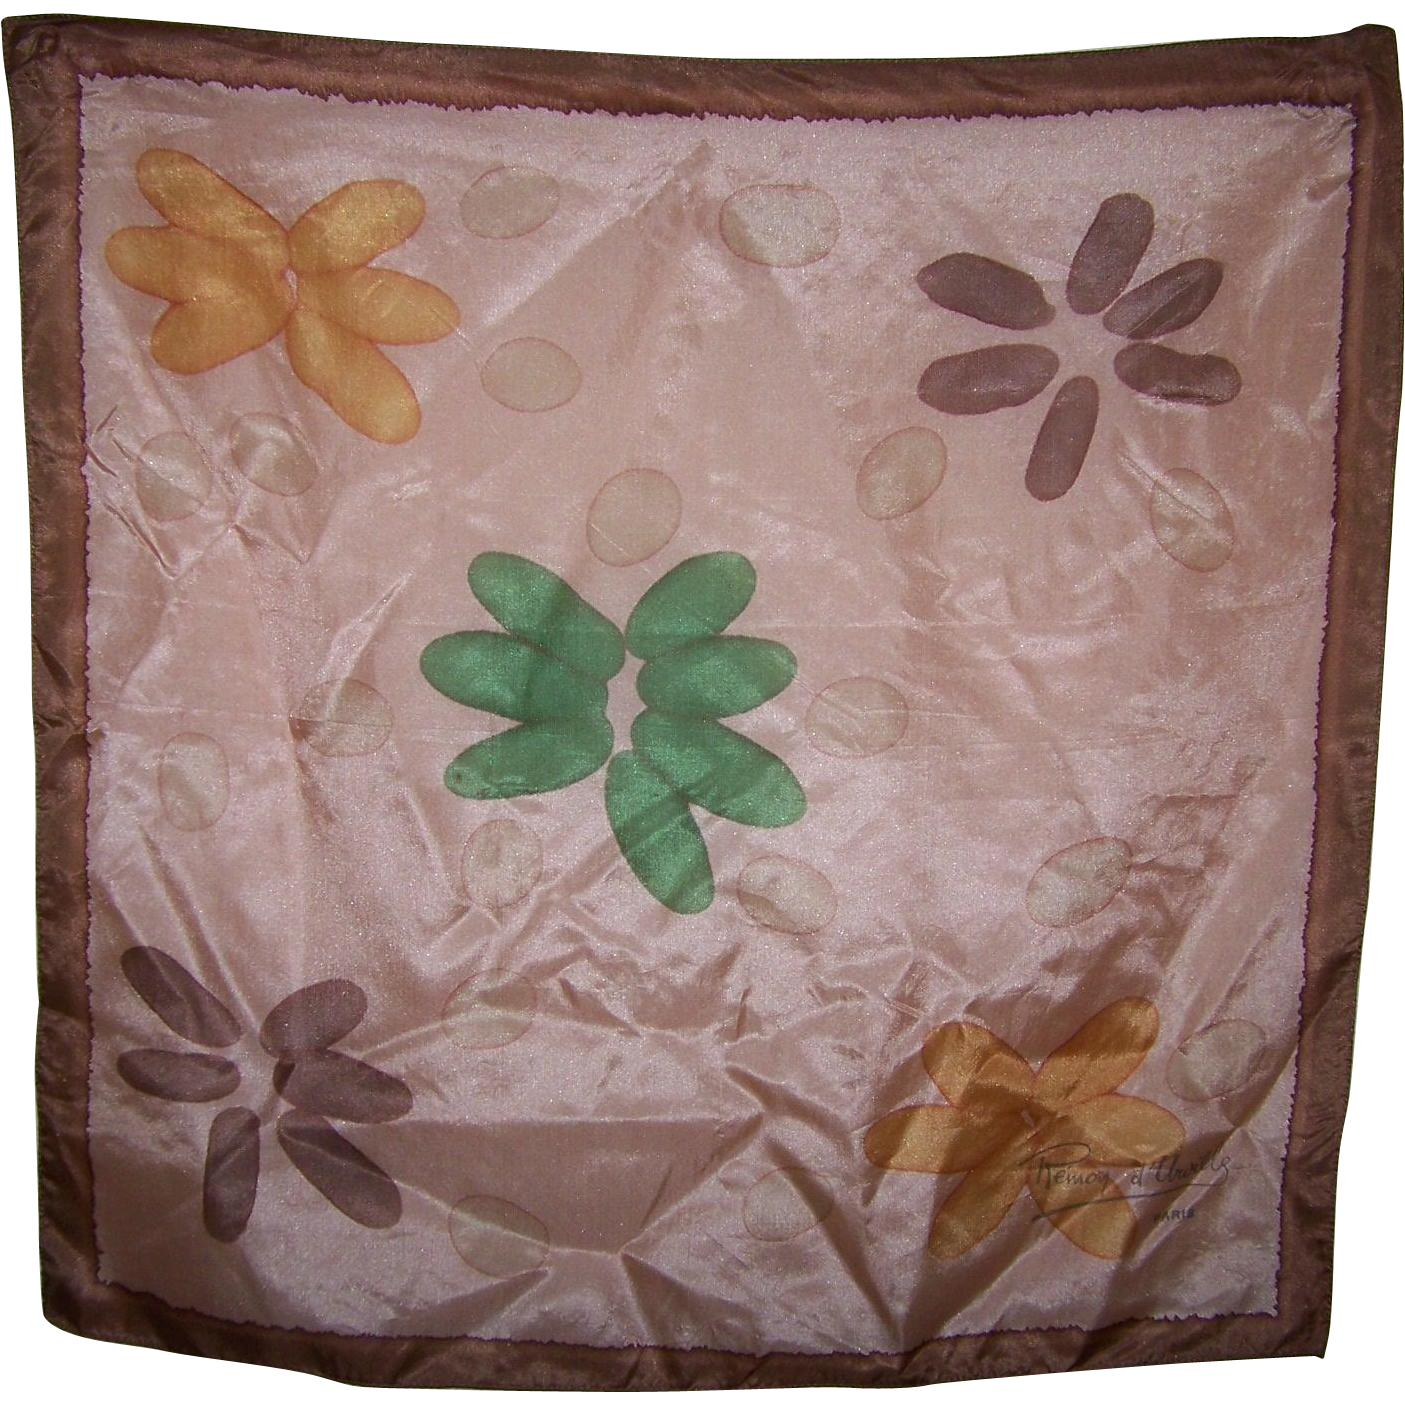 Lovely Designer Signed REMOY d'URVILLE Paris Hand Printed Silk Scarf